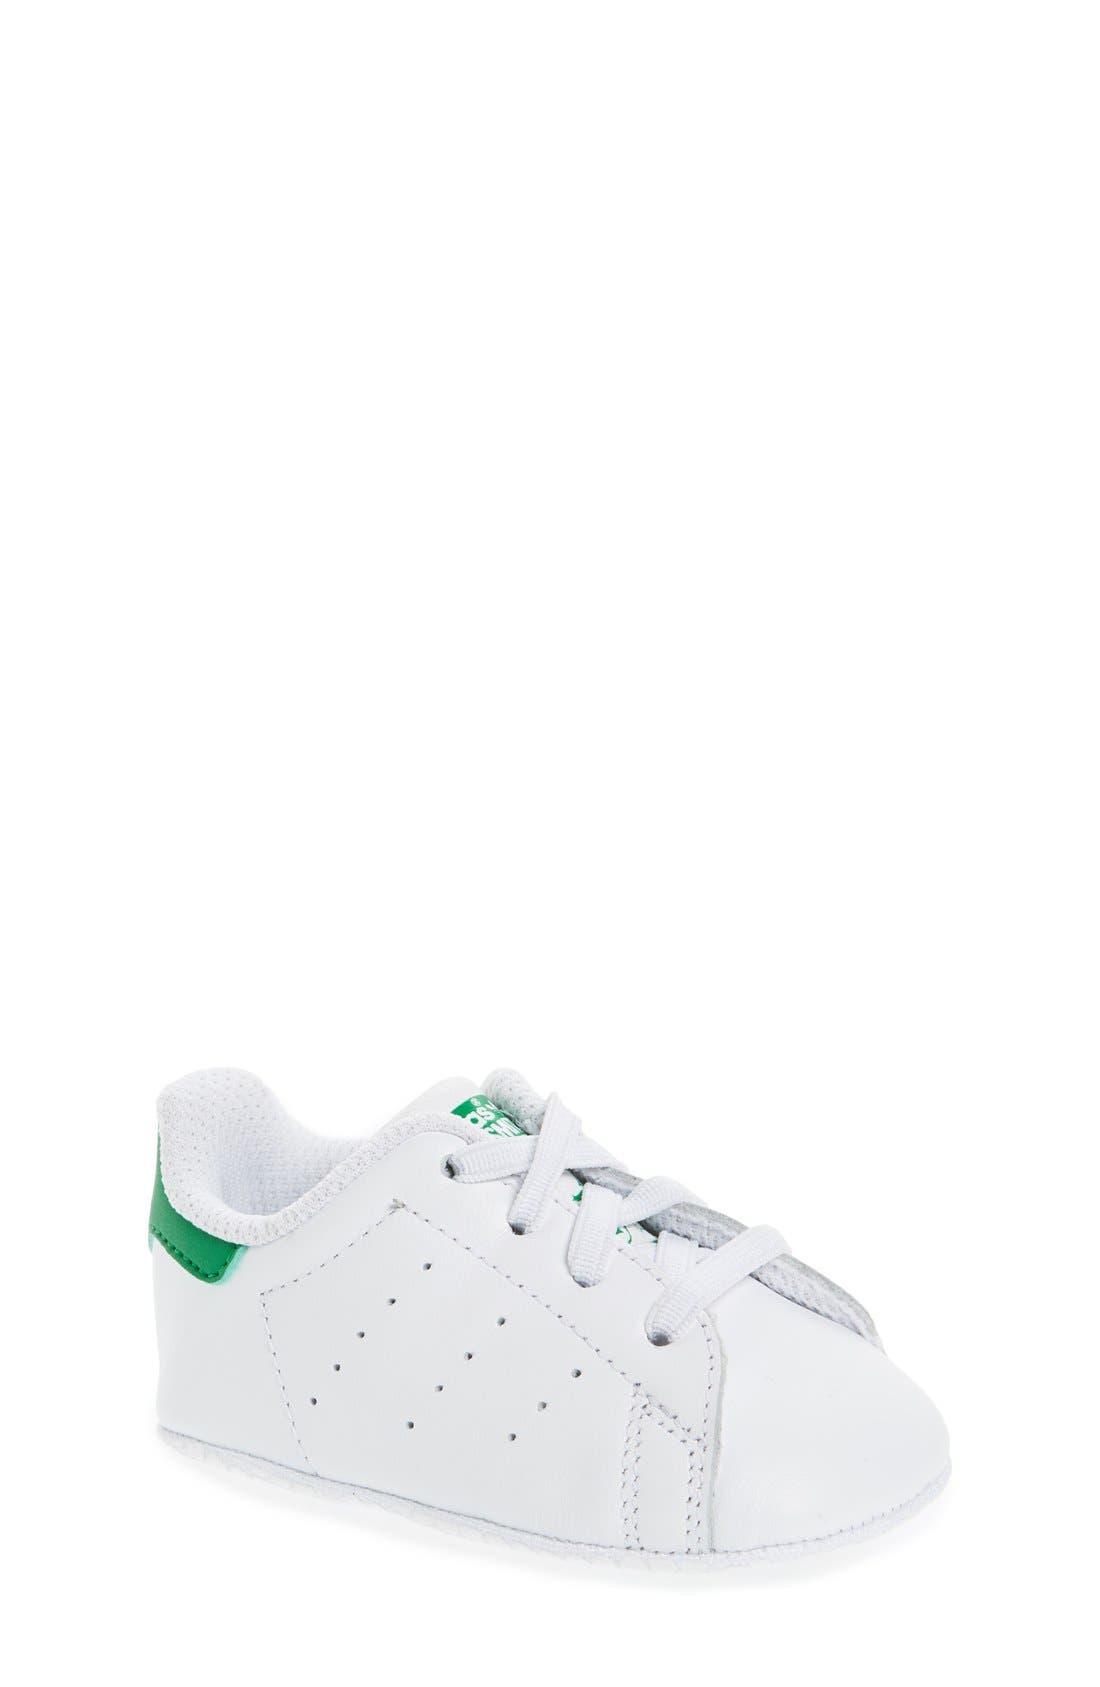 Main Image - adidas Stan Smith Crib Sneaker (Baby)